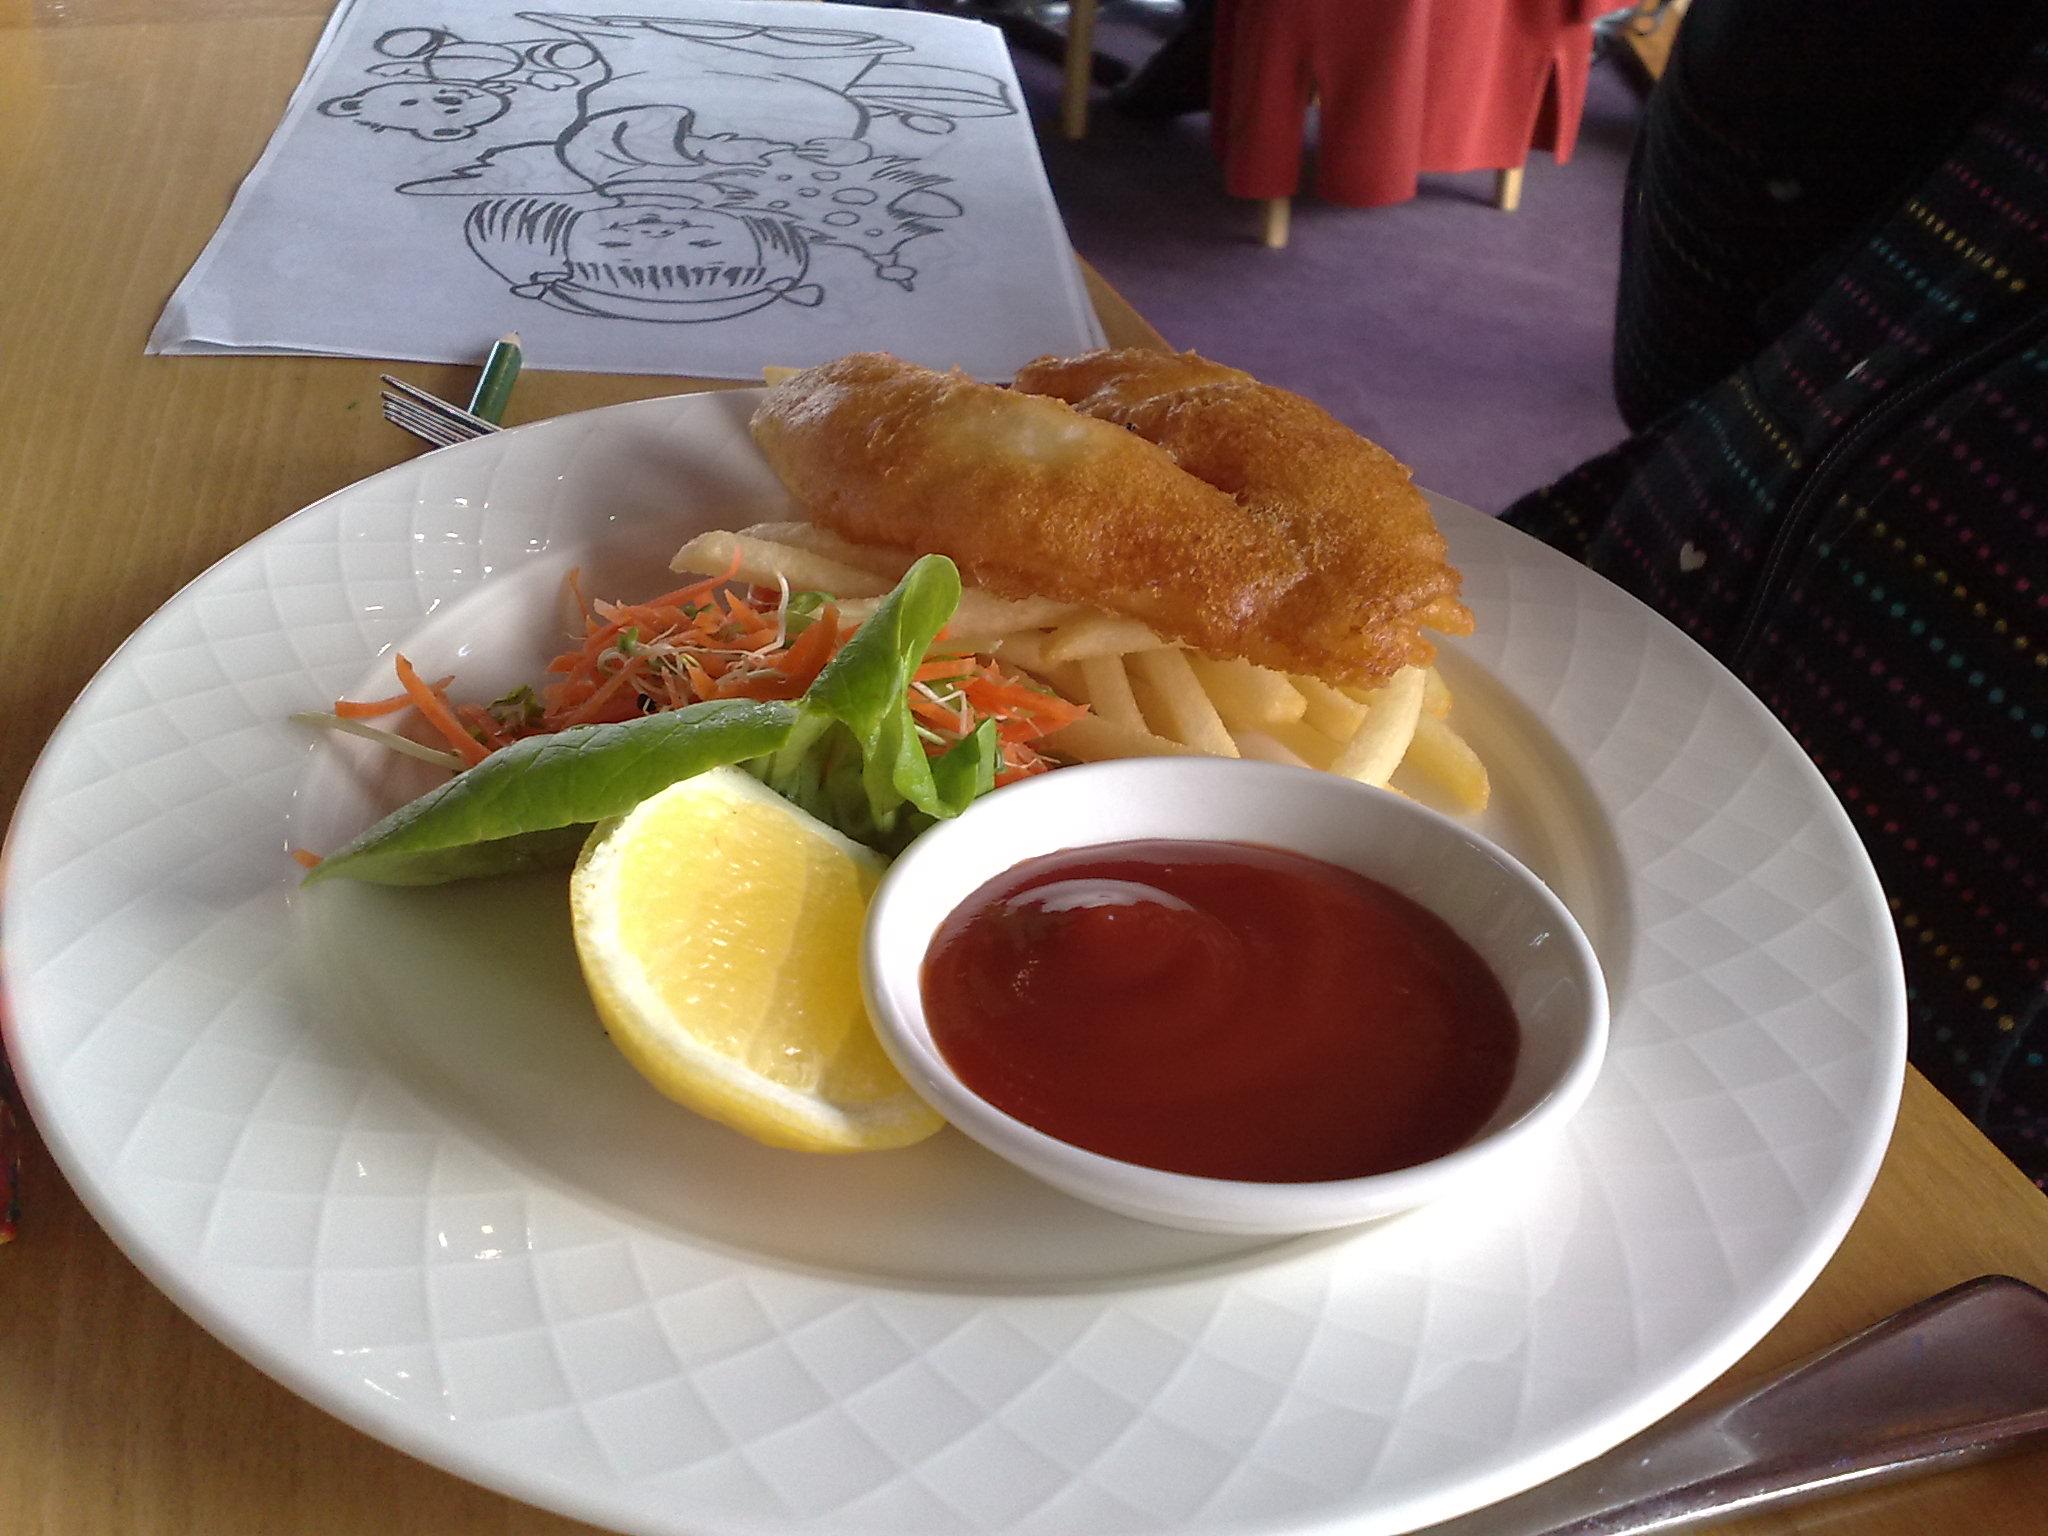 Child's fish and fries